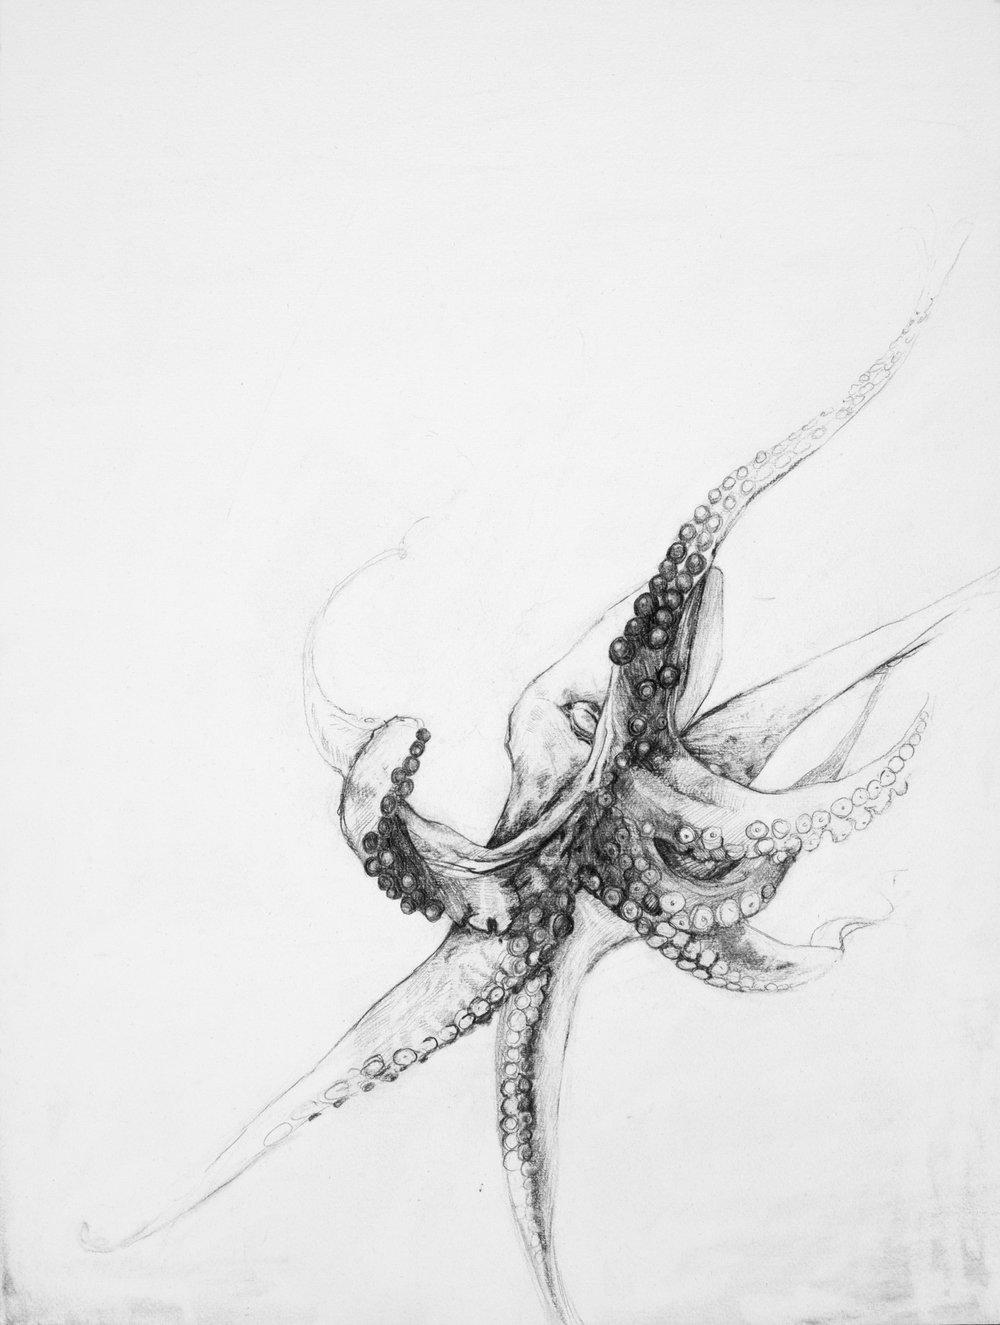 Octodrone